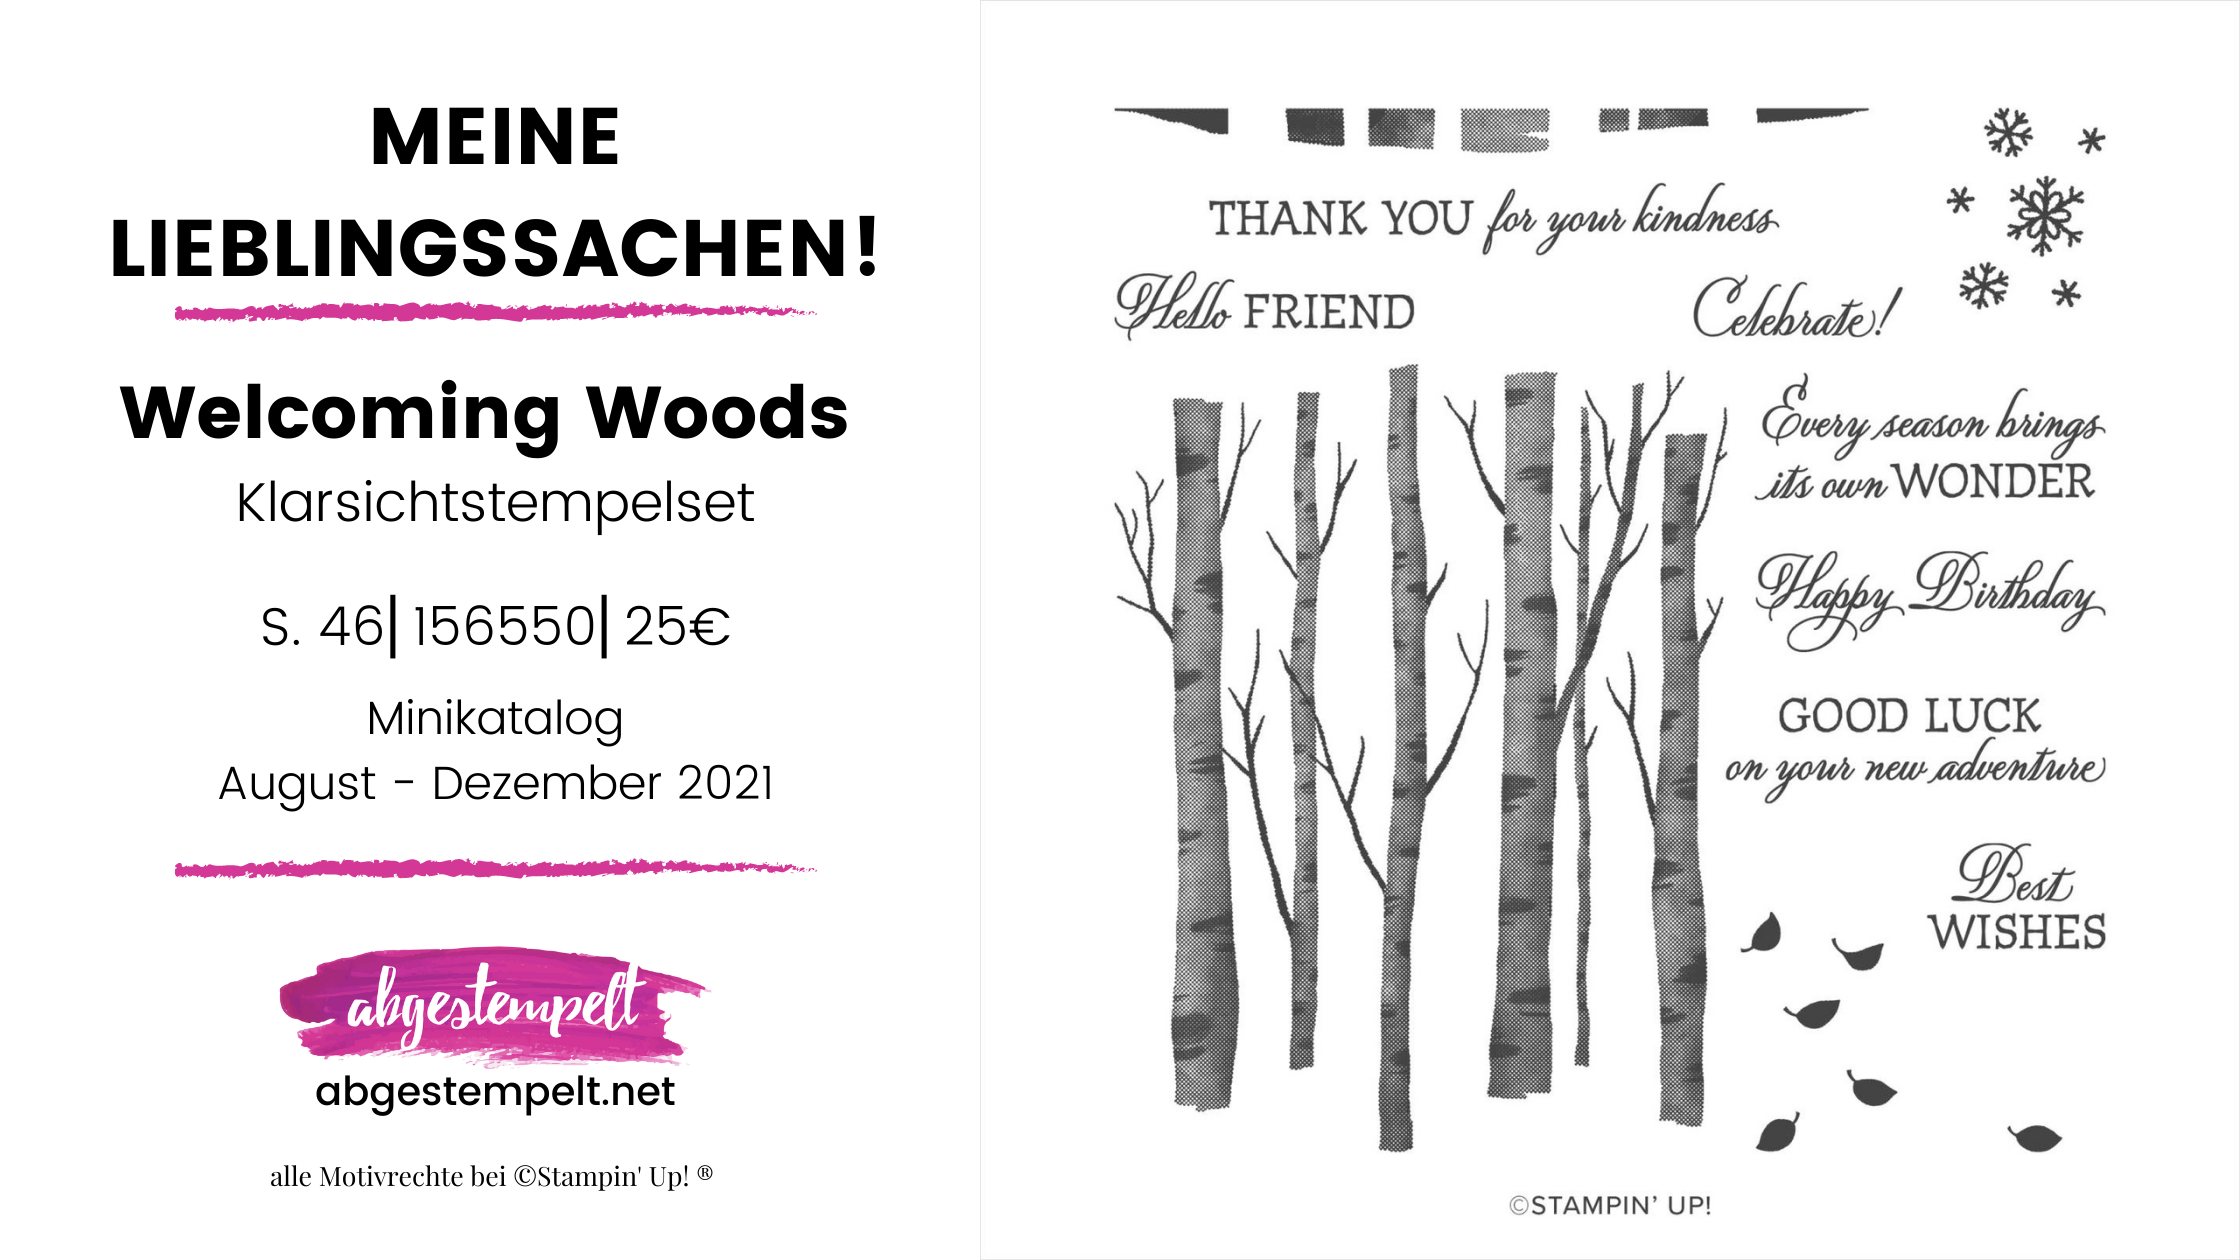 Welcoming Woods Stampin Up Lieblingssachen